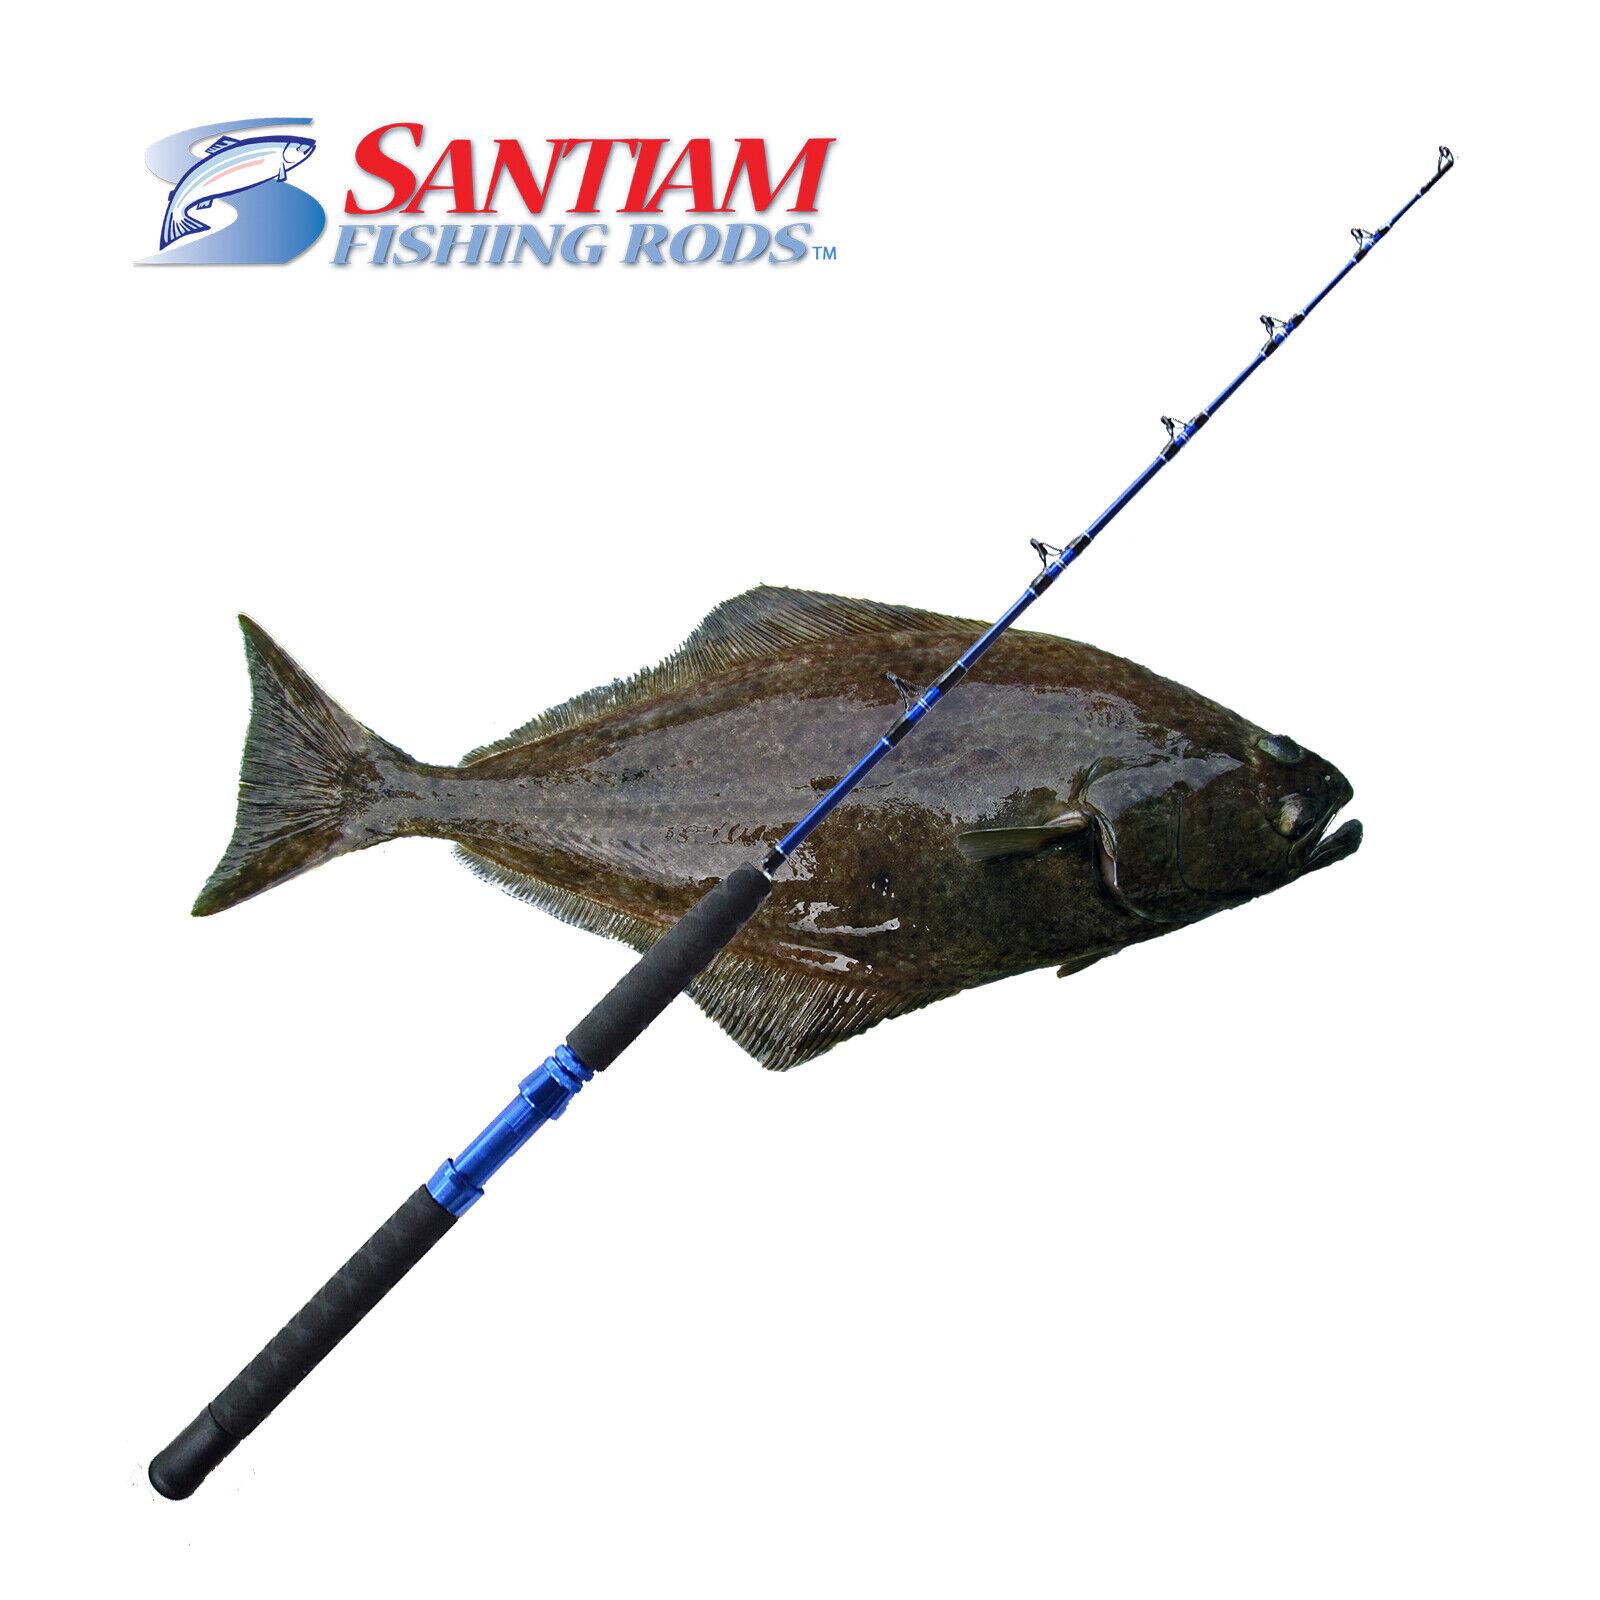 SANTIAM FISHING RODS 1 PC 48  30-130 LB HALIBUT TUNA ALASKAN TRAVEL SERIES